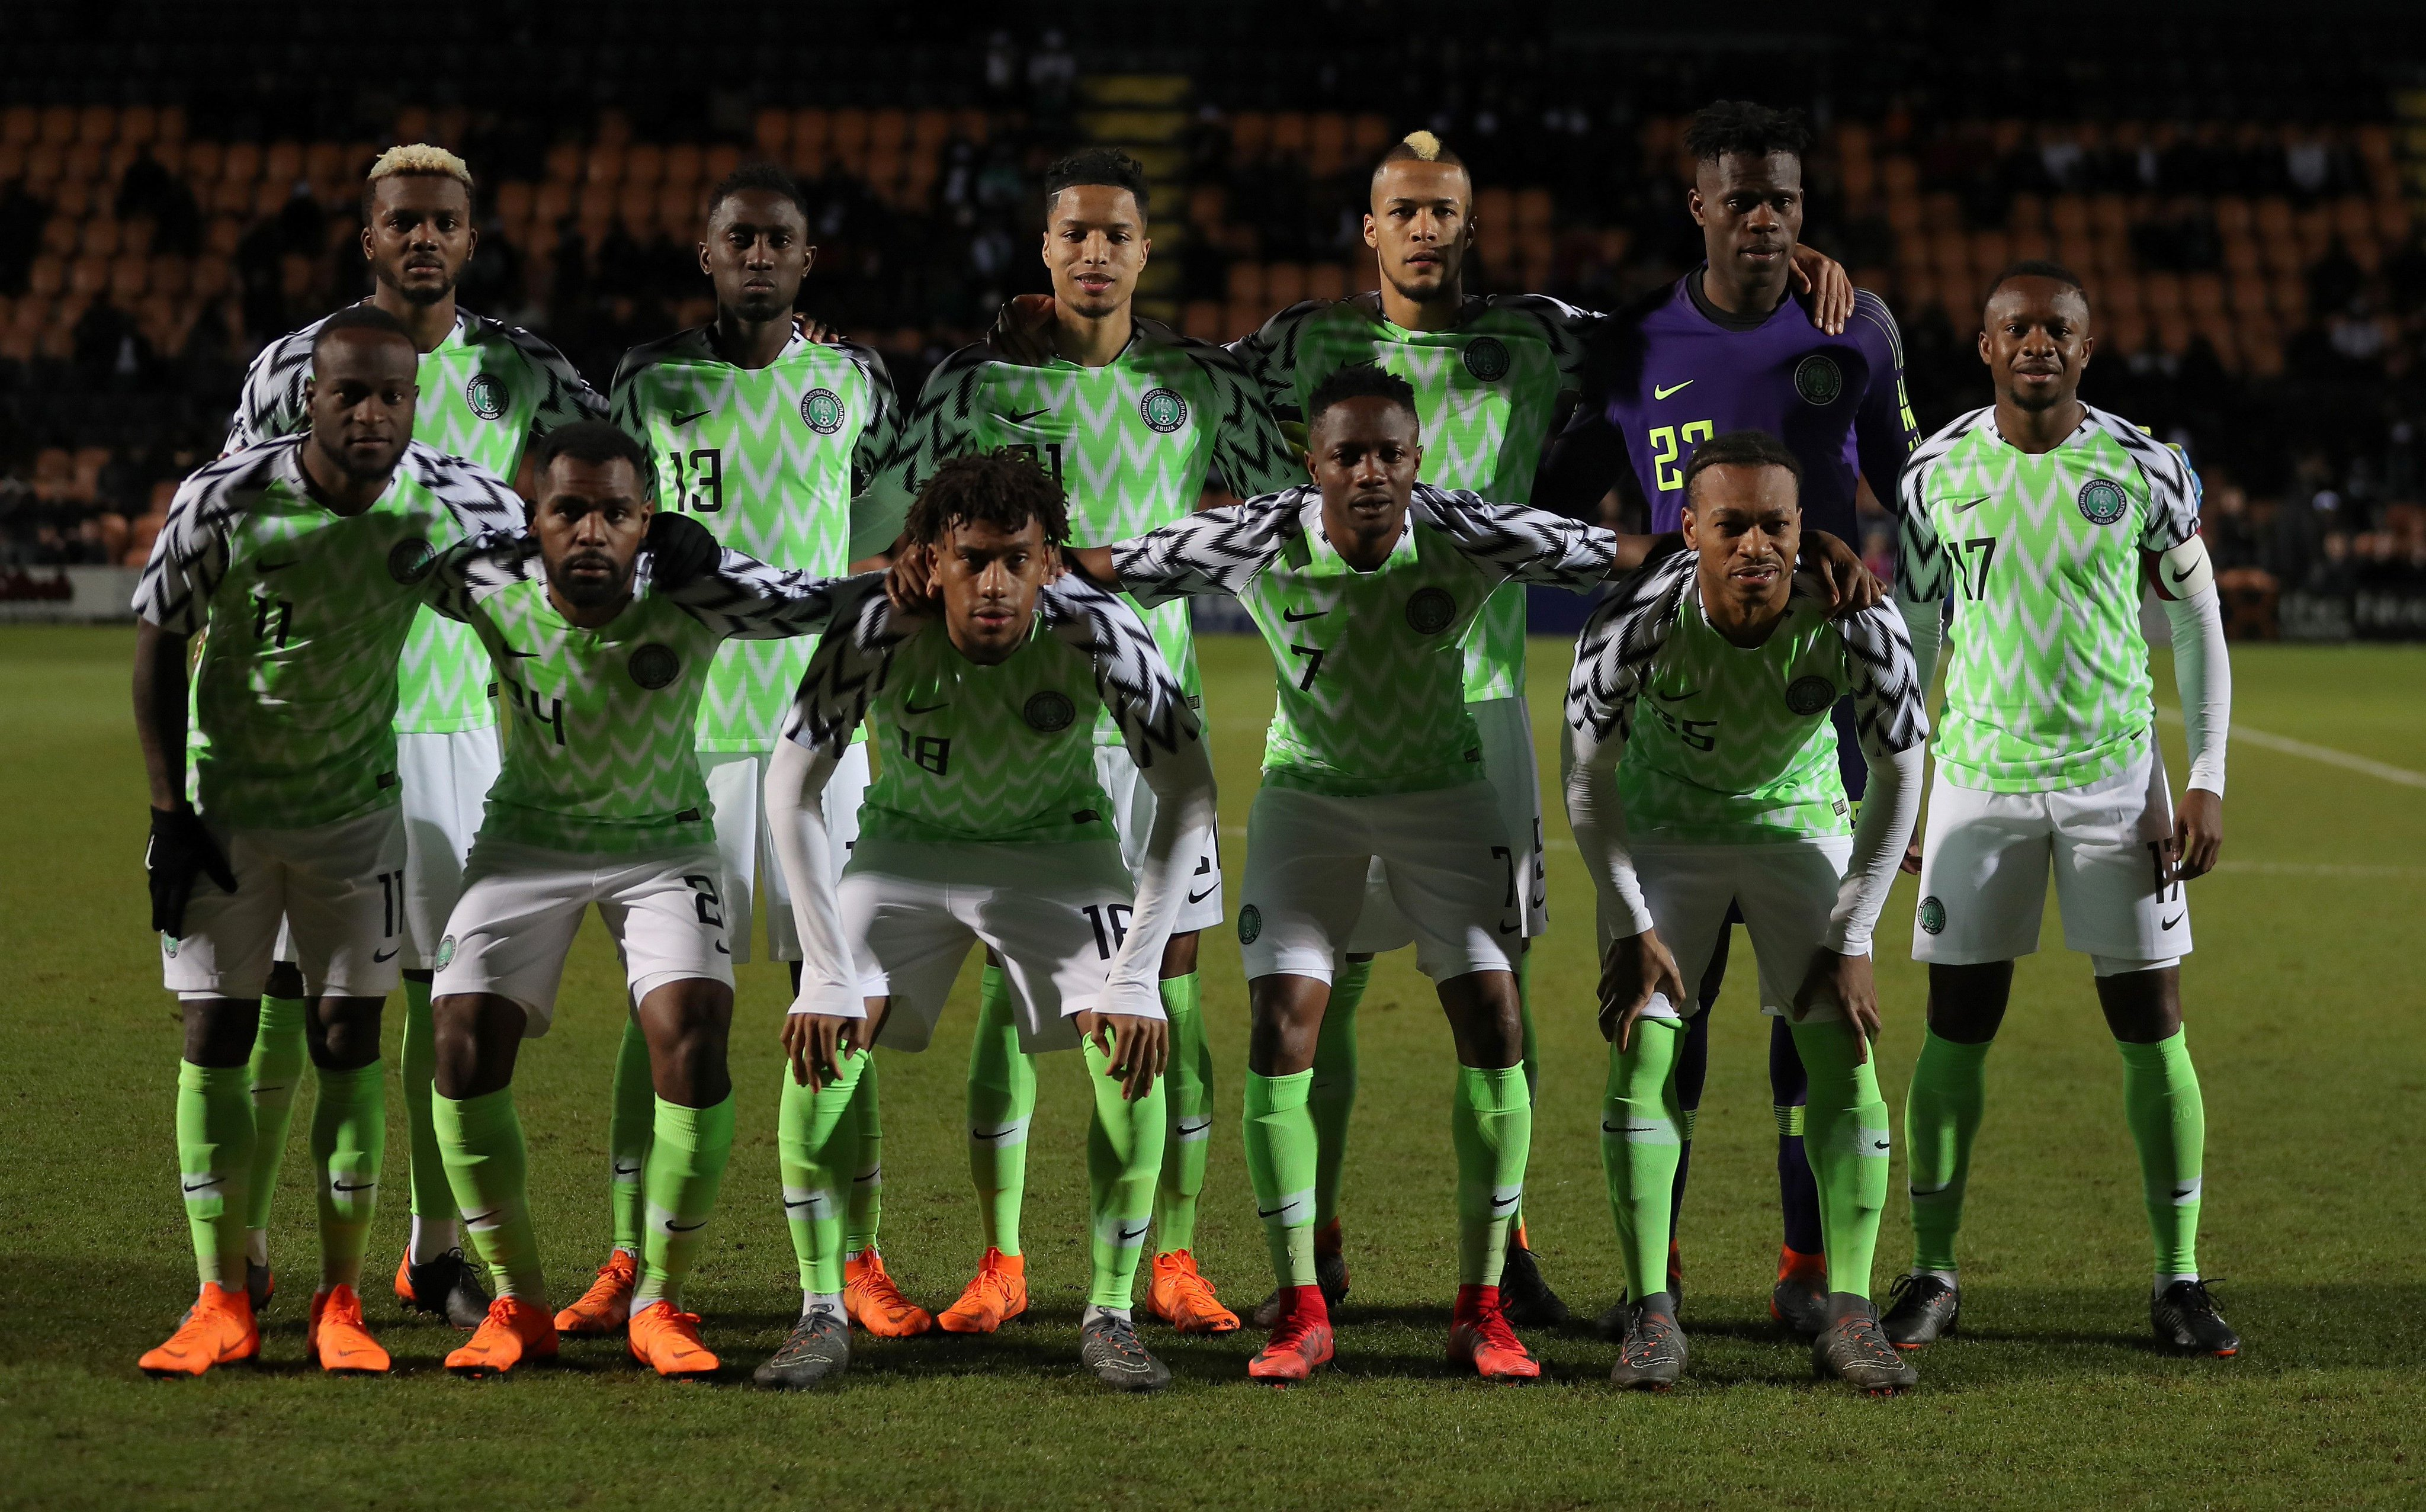 Домашняя форма сборной Нигерии 2018 года